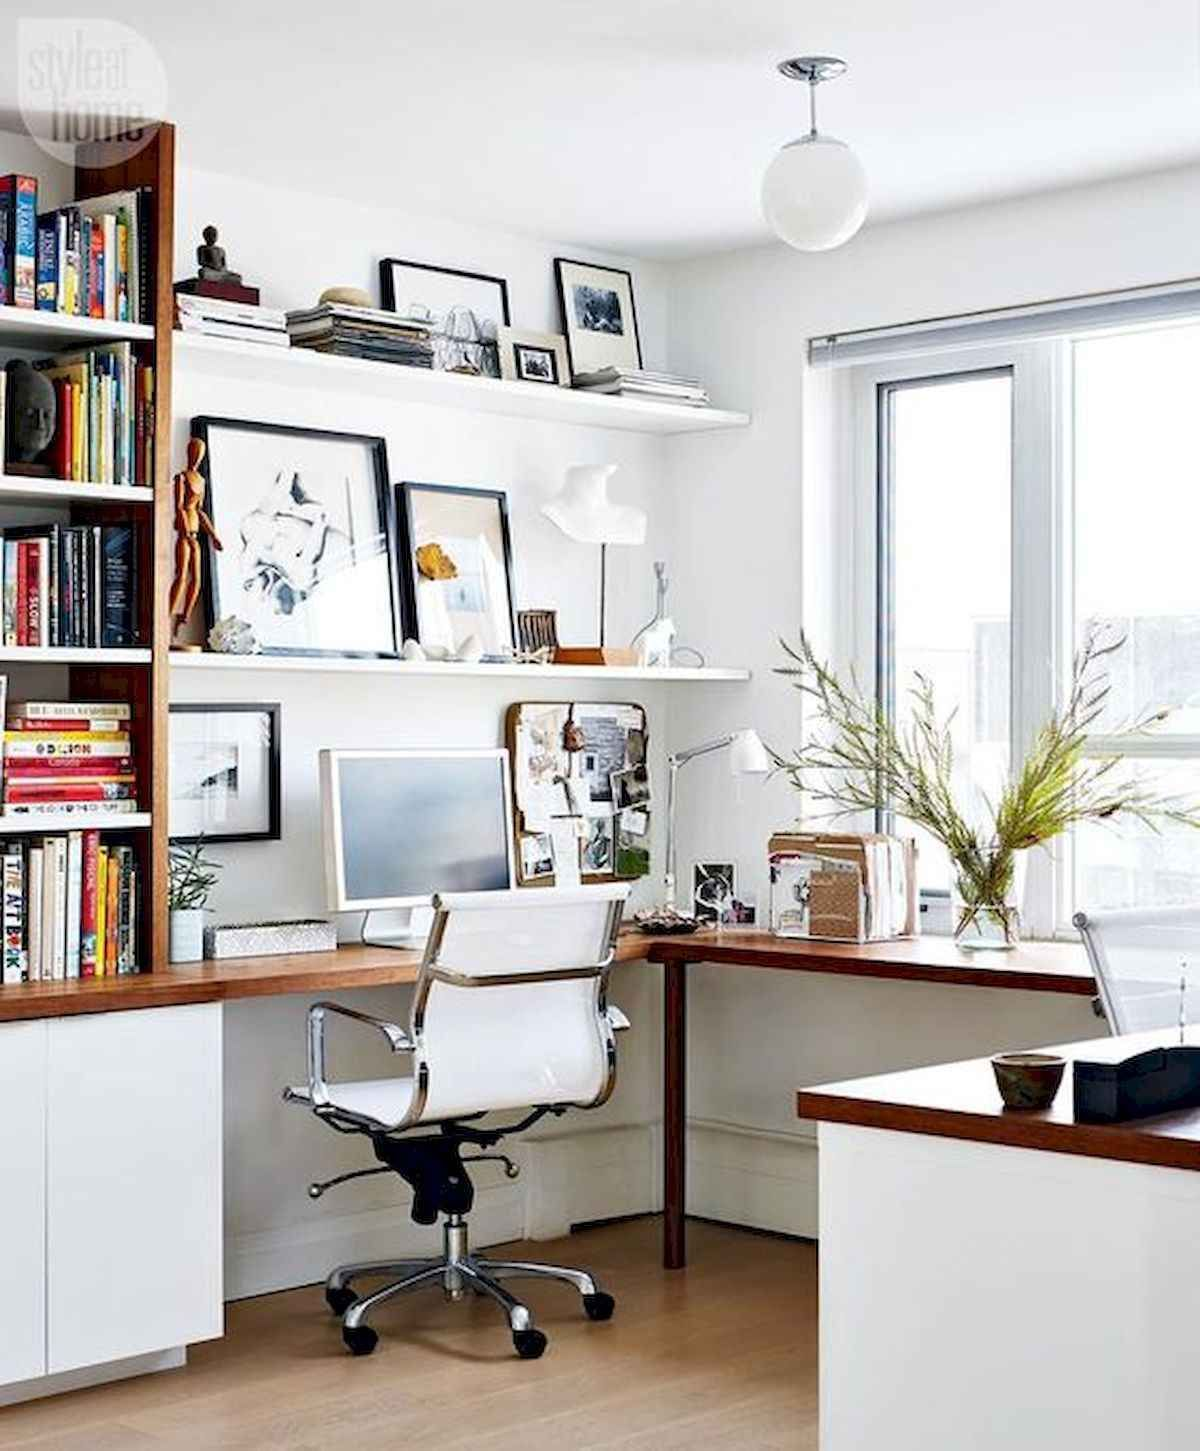 55 Brilliant Workspace Desk Design Ideas On A Budget 40 In 2020